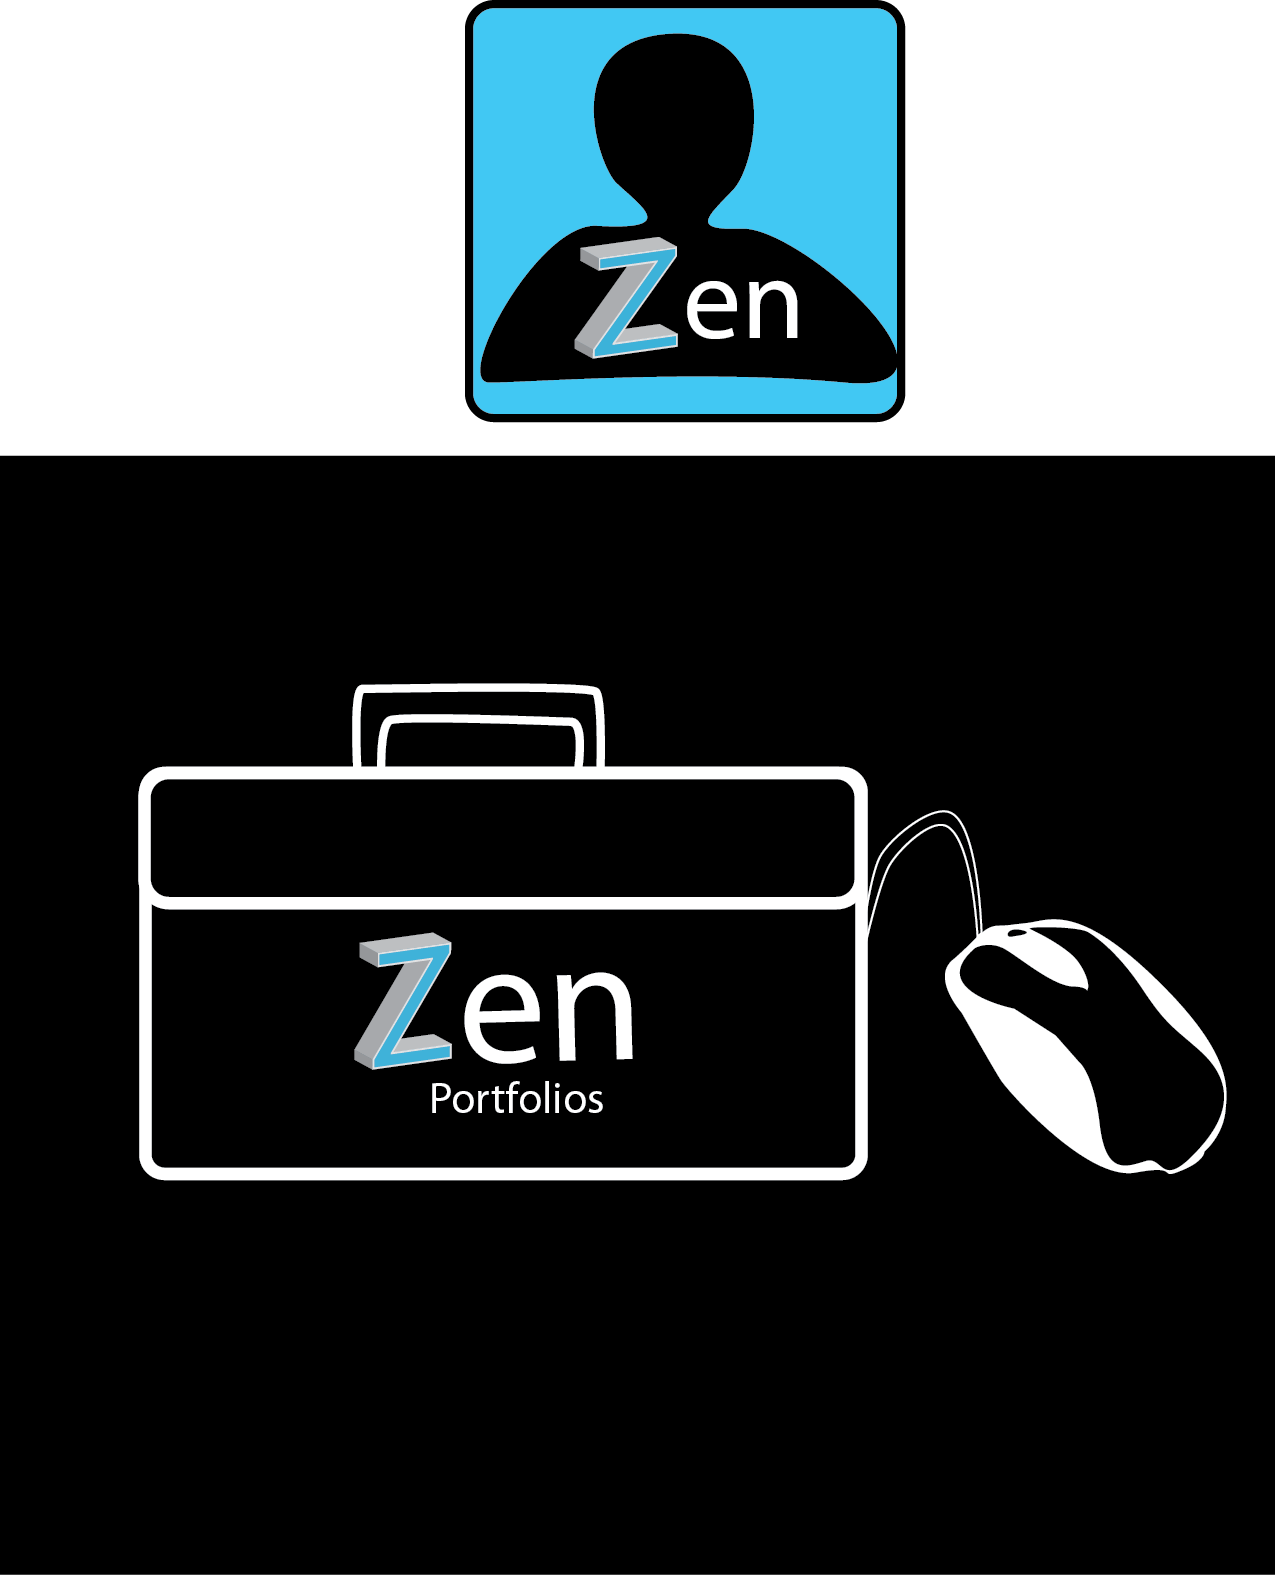 Logo Design by supermansw11 - Entry No. 138 in the Logo Design Contest New Logo Design for ZEN Portfolios.